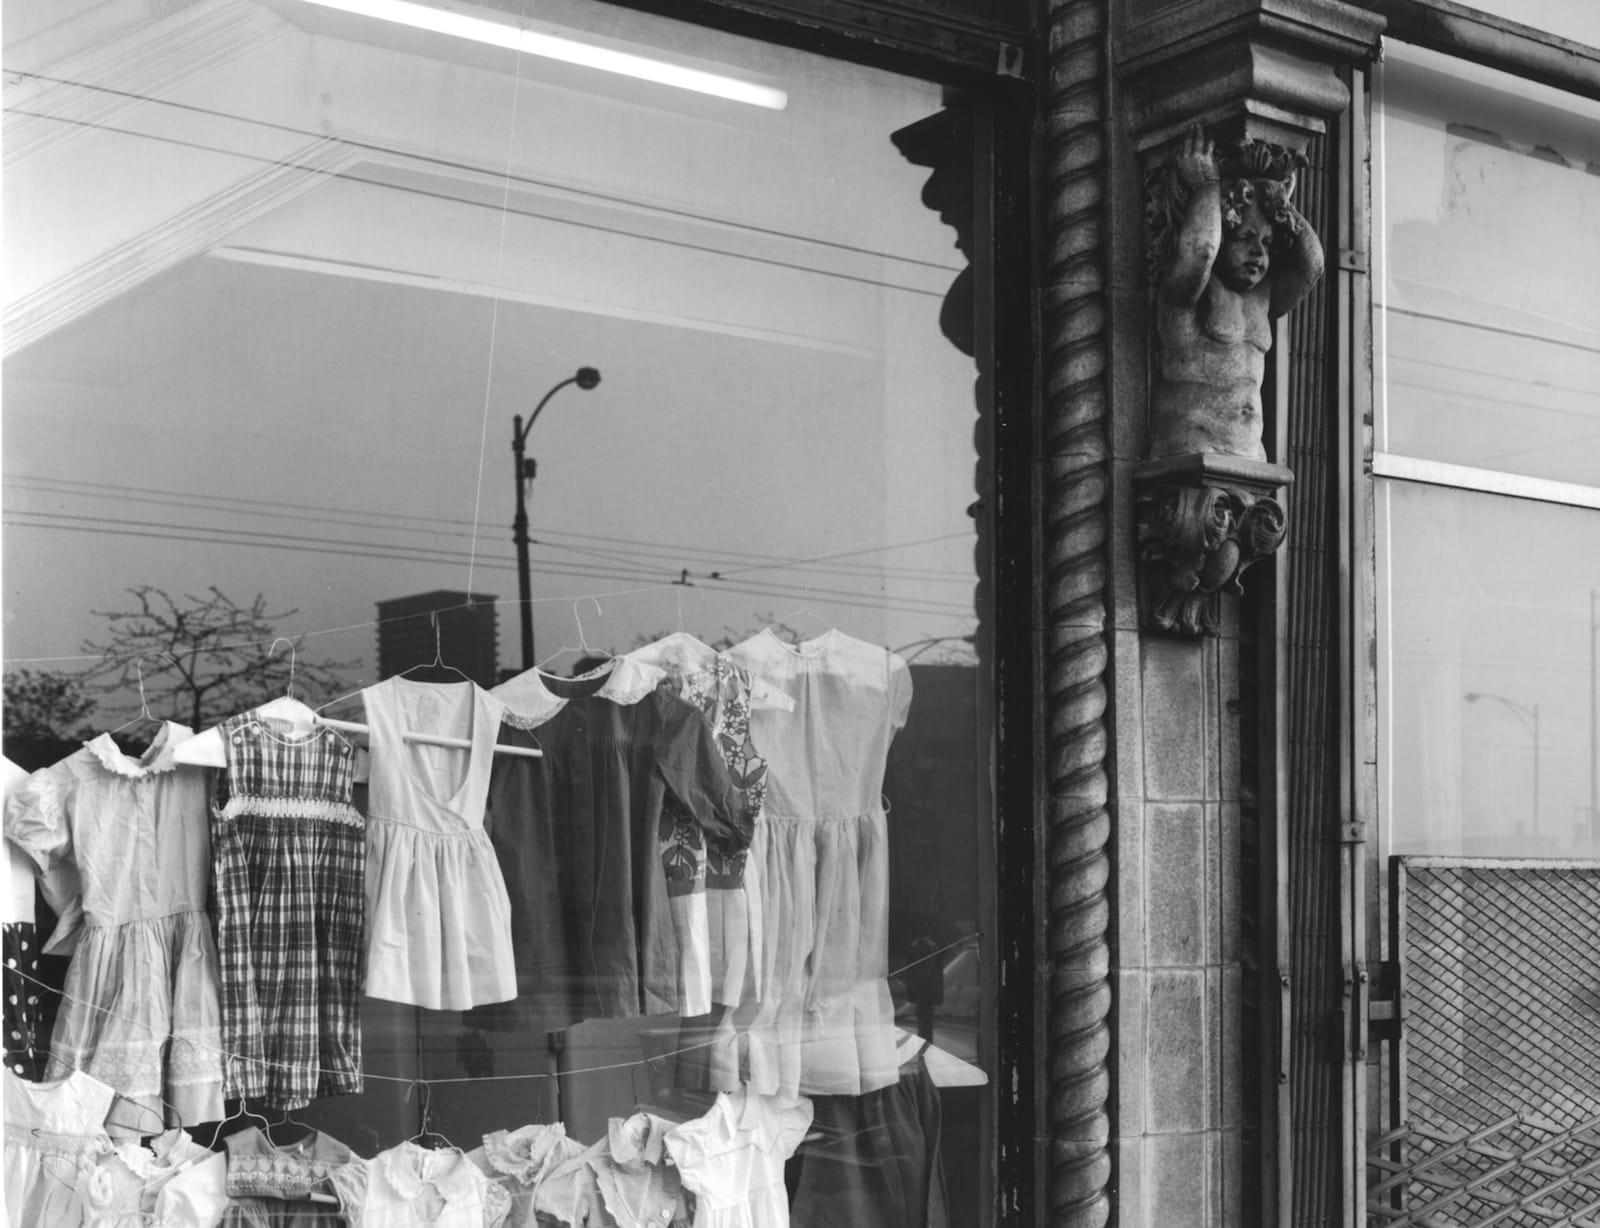 Bob Thall, Roosevelt Road, east of Maxwell Street, 1972